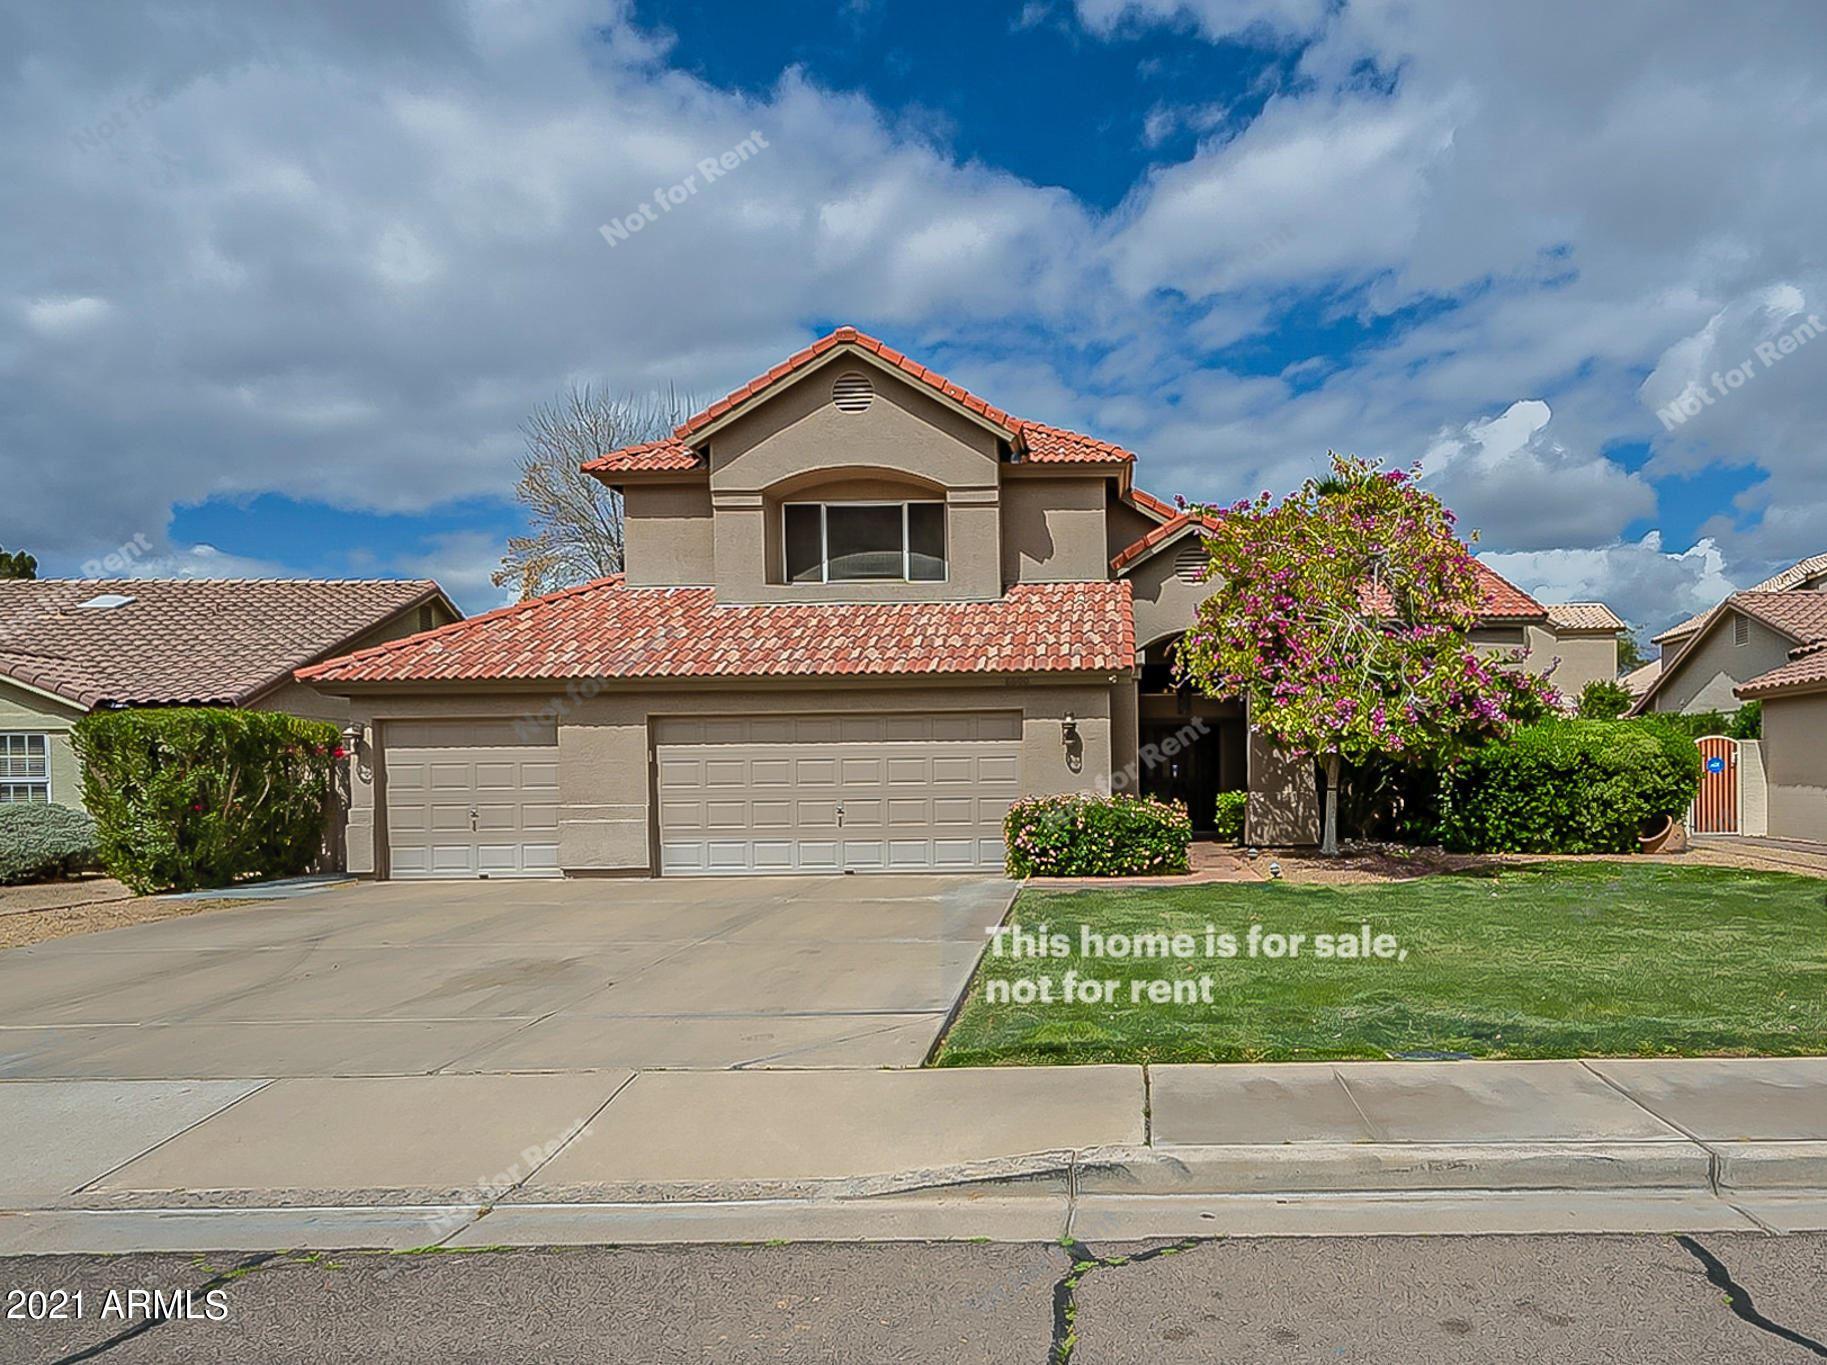 8600 S MAPLE Avenue, Tempe, AZ 85284 - MLS#: 6213686